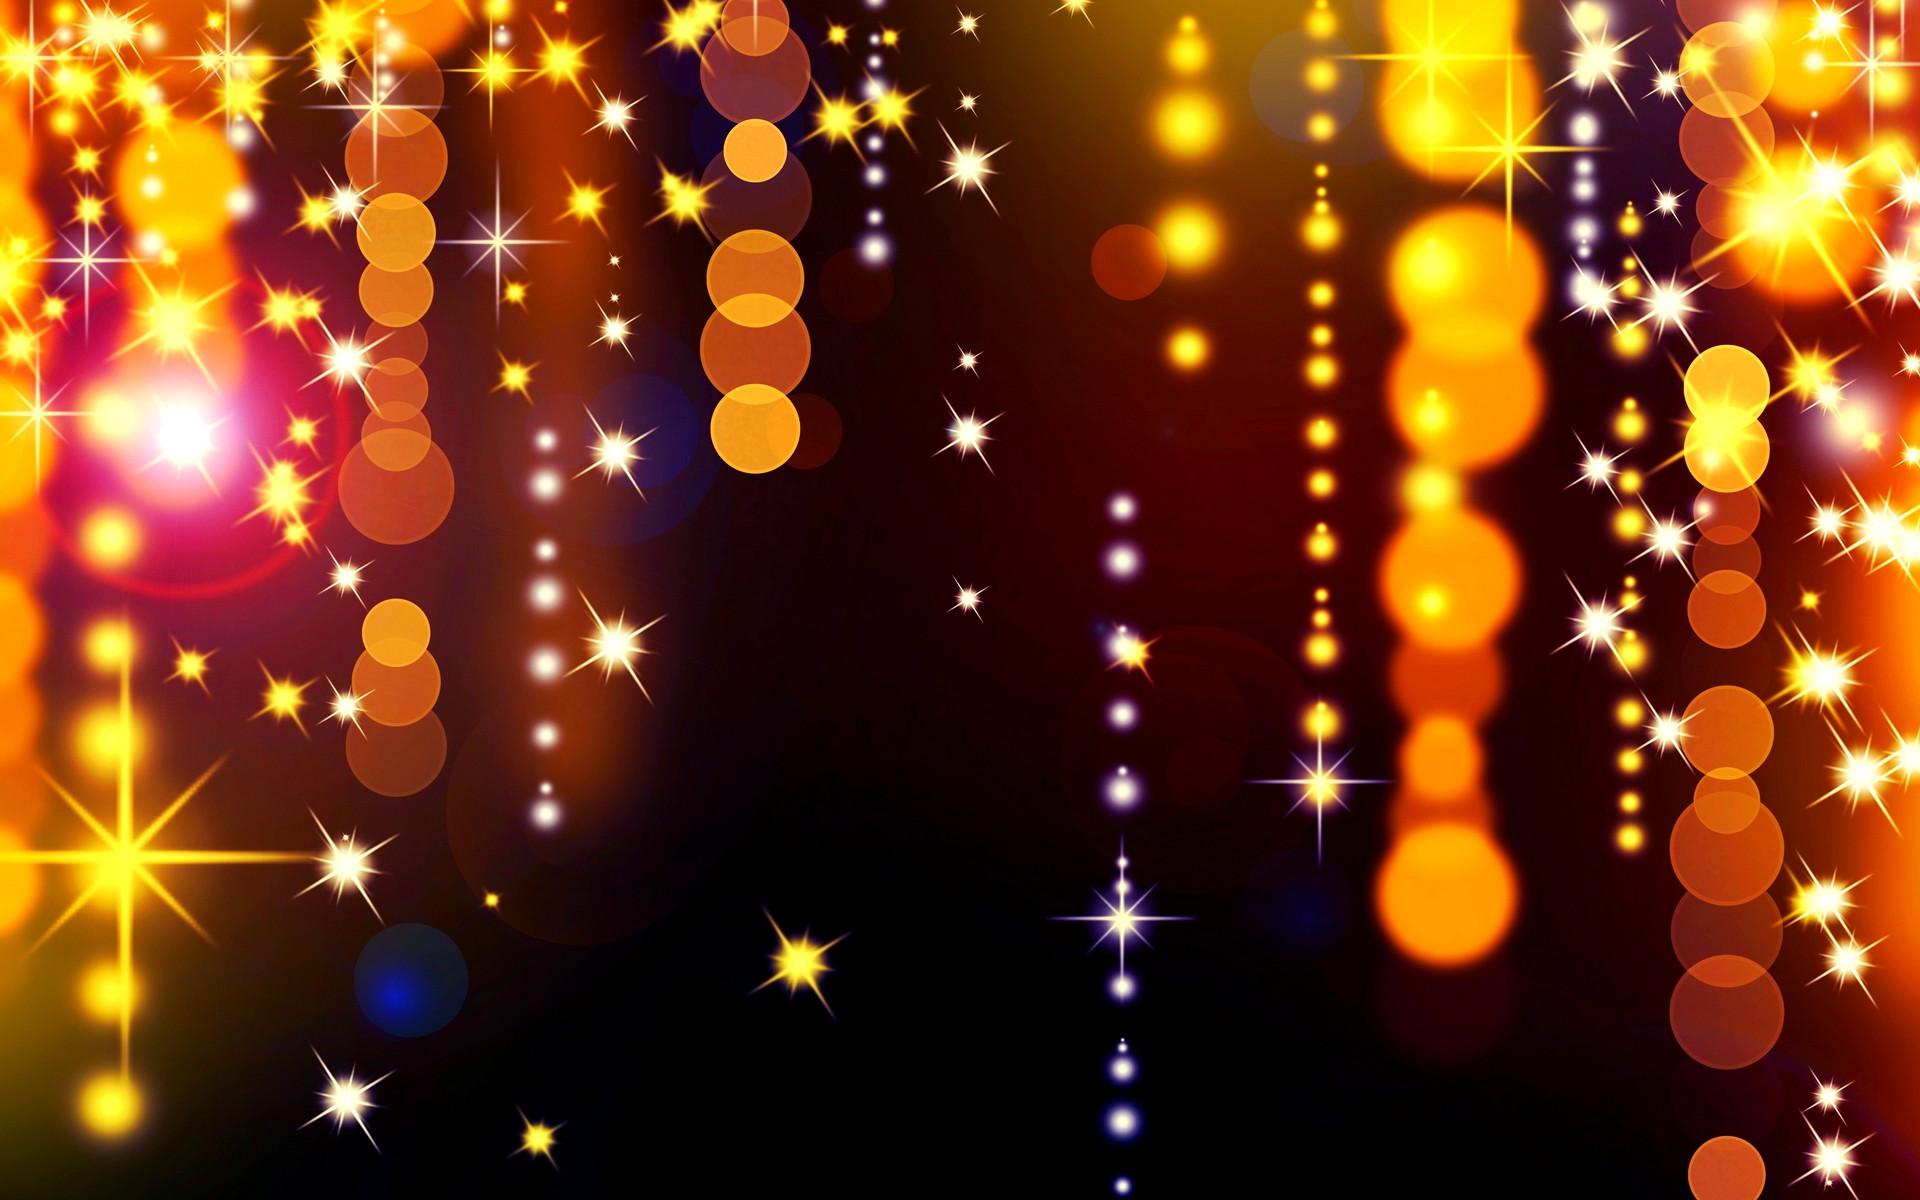 Christmas Lights Desktop Background Page 1